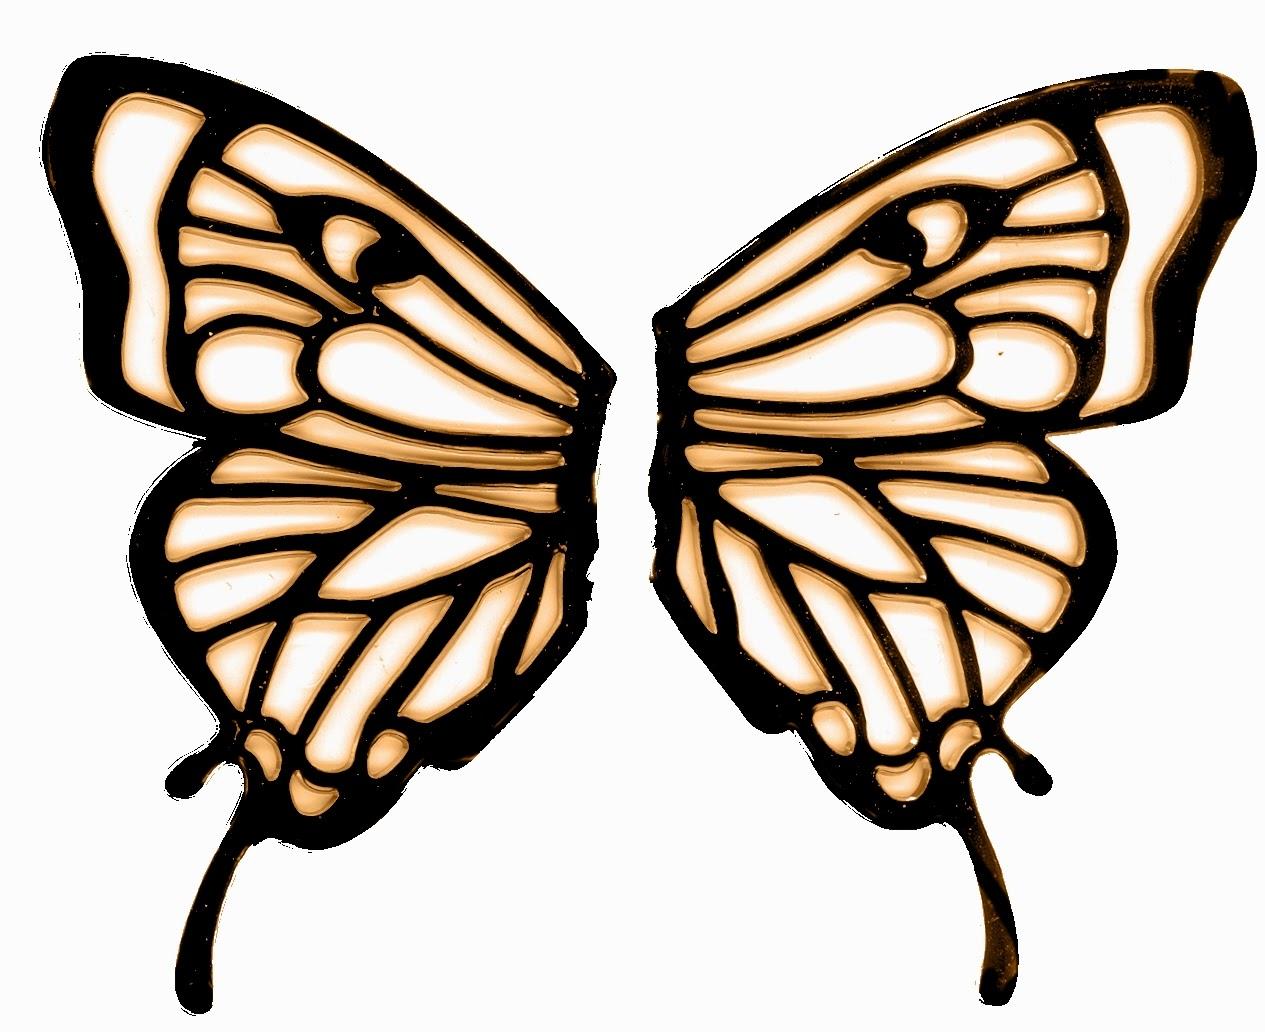 Butterfly Wings Design - ClipArt Best